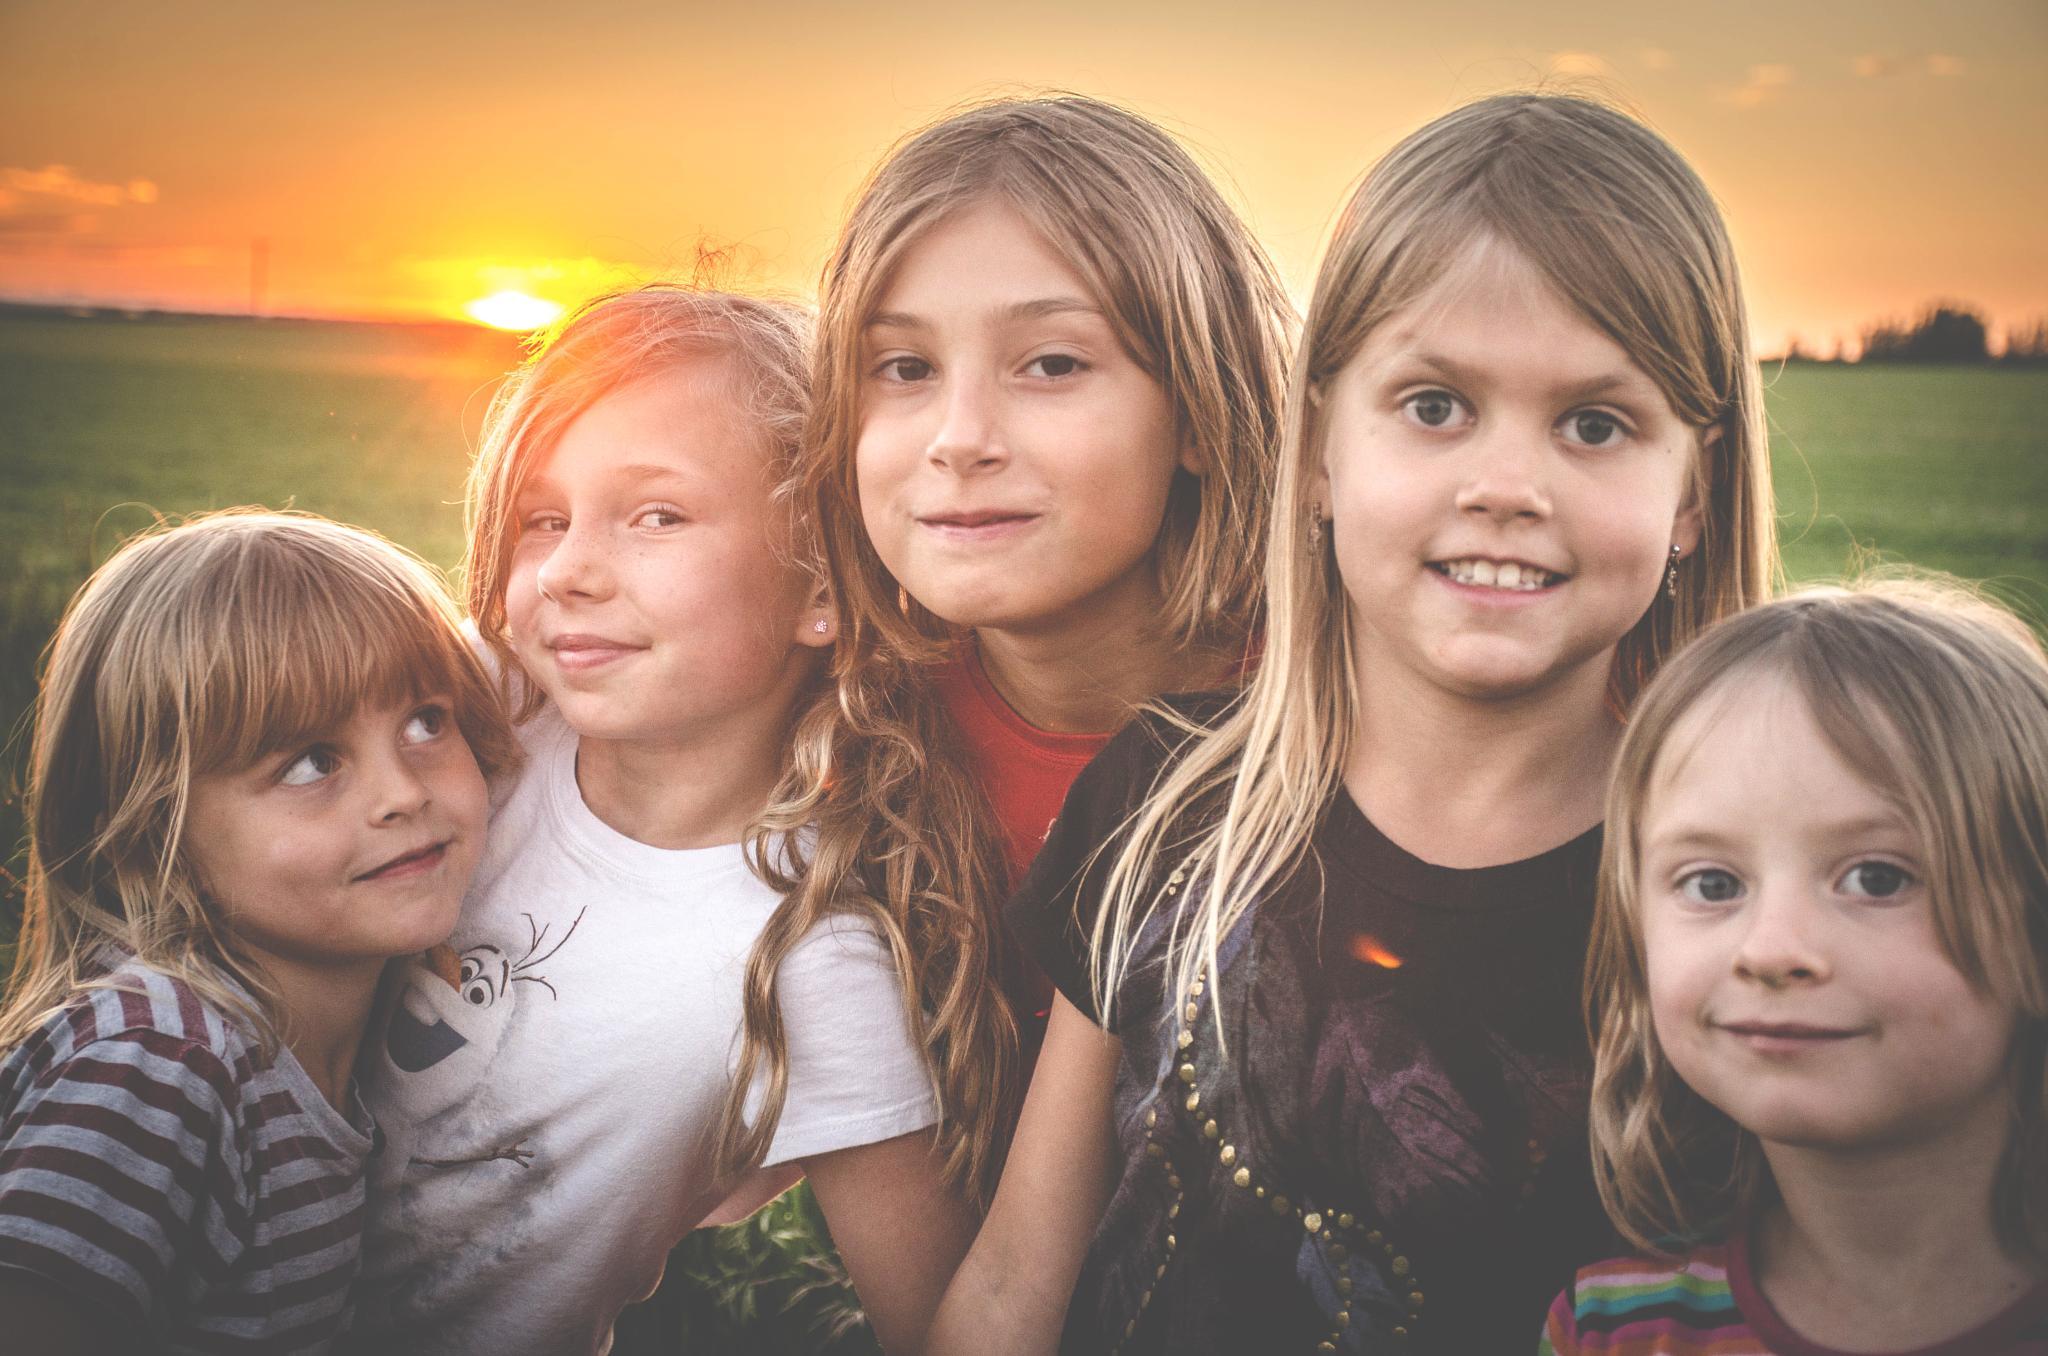 The Cool Kids by Ang Klassen